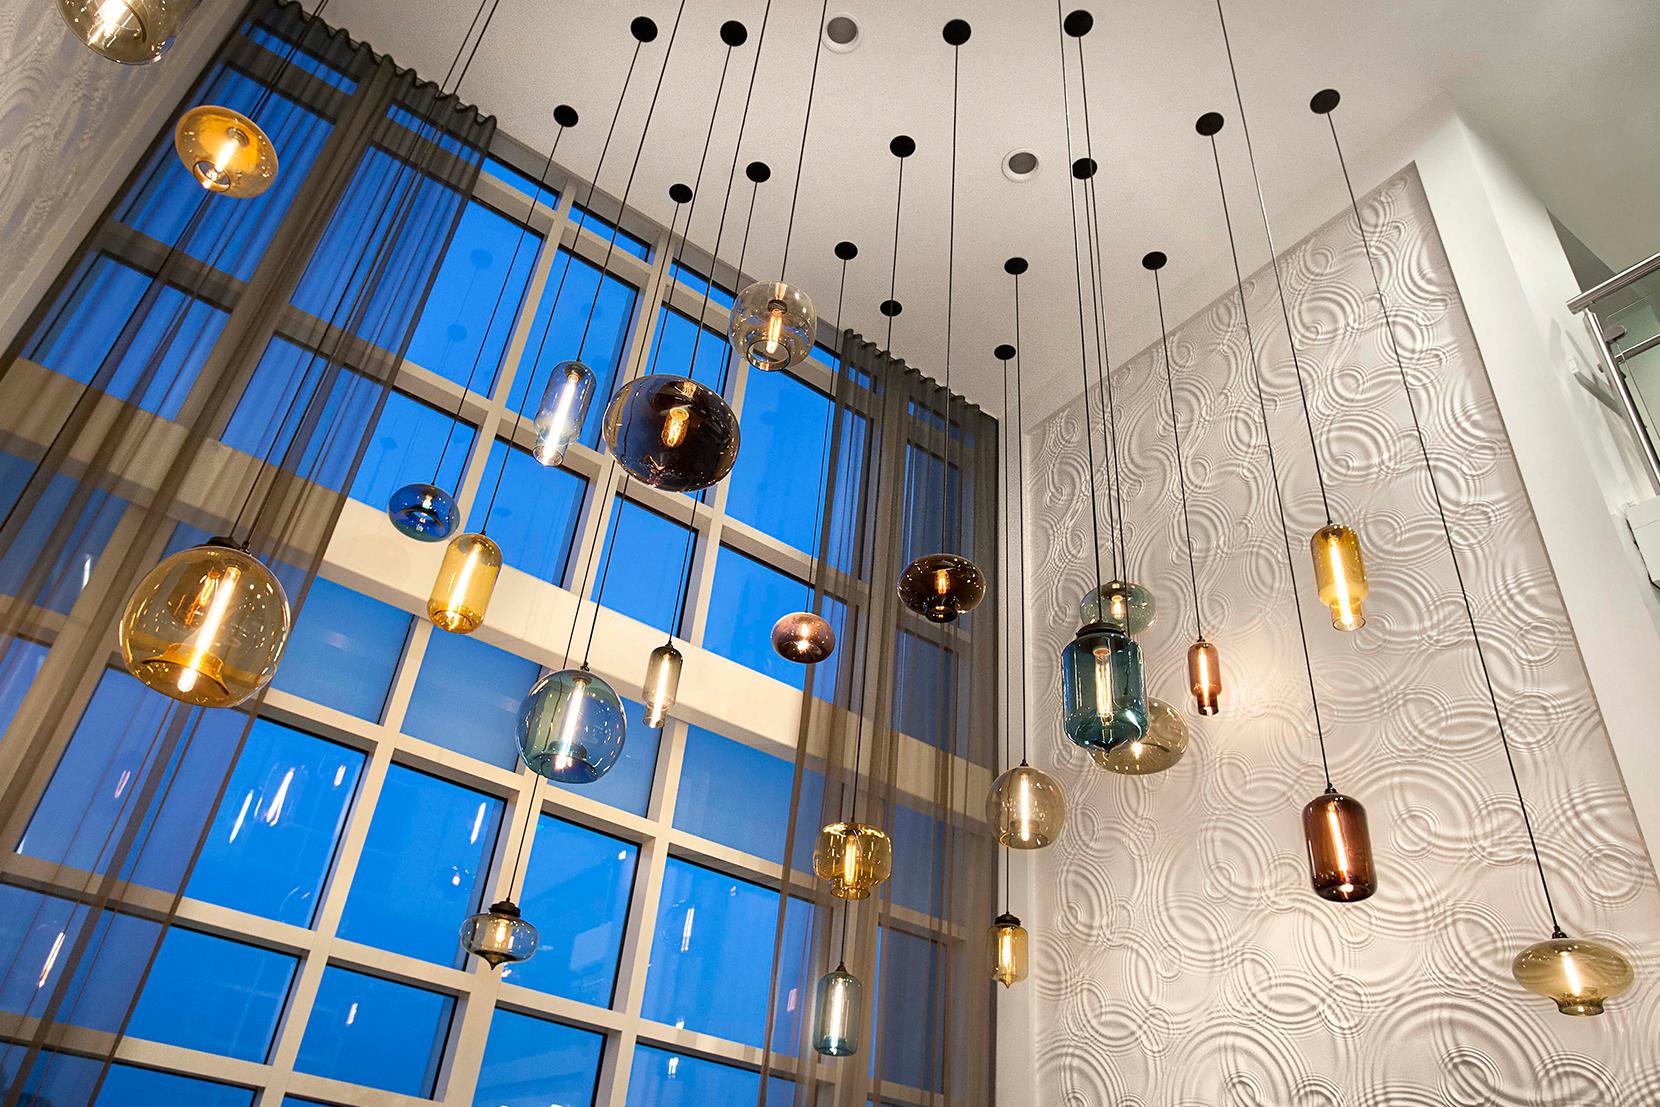 Hilton-Grand-Modern-Pendant-Lighting-Hotel-Lobby.png